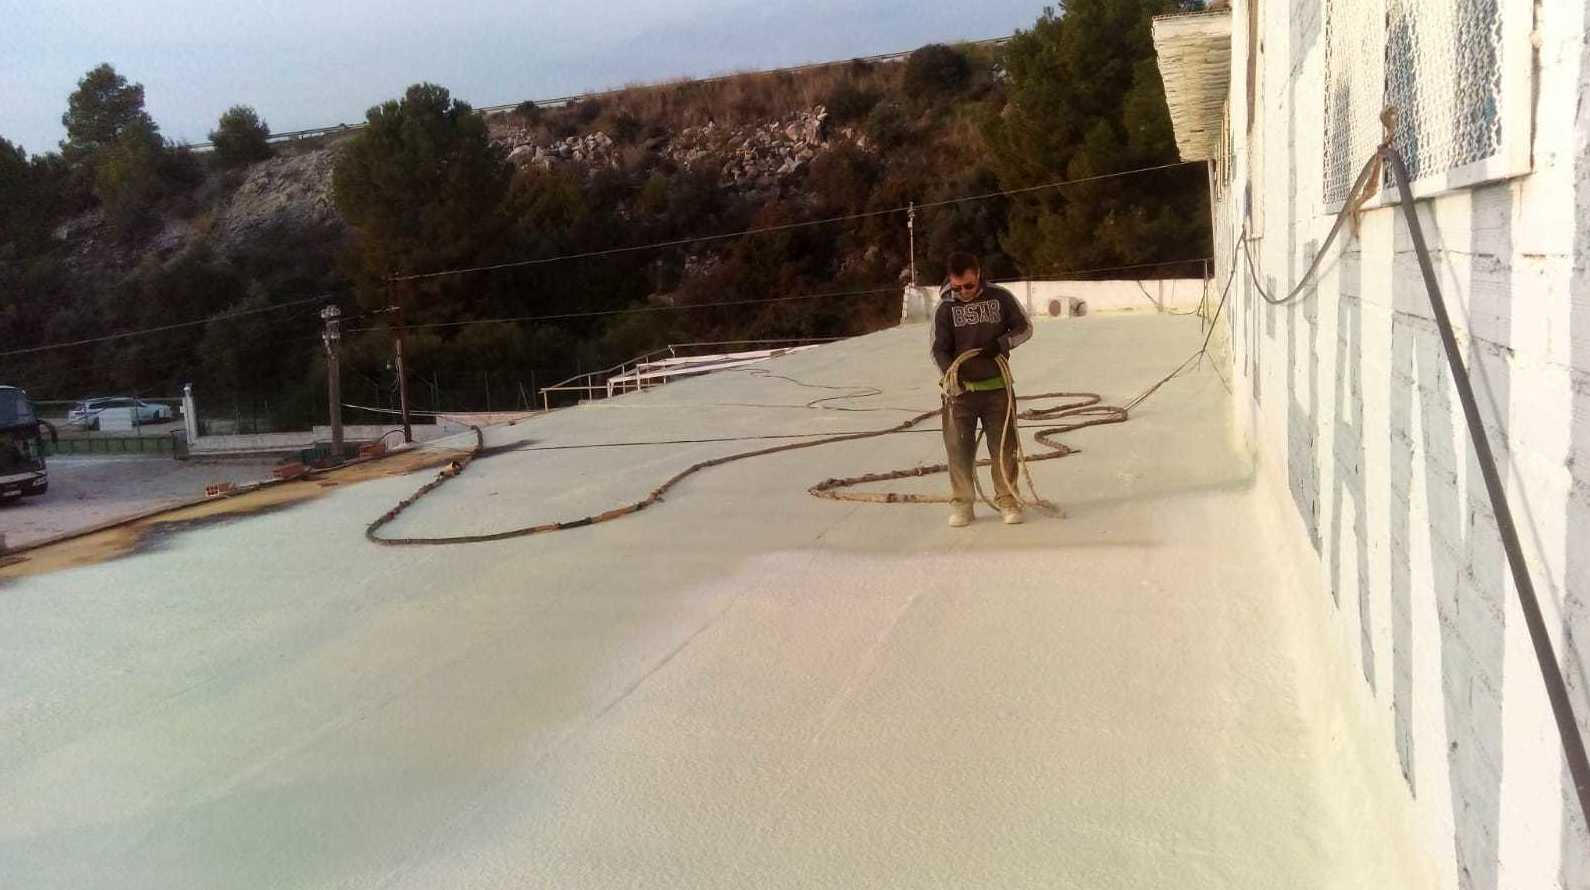 Foto 2 de Aislamientos acústicos y térmicos en Rafelcofer | Aislamientos de Poliuretano Jaime Femenia